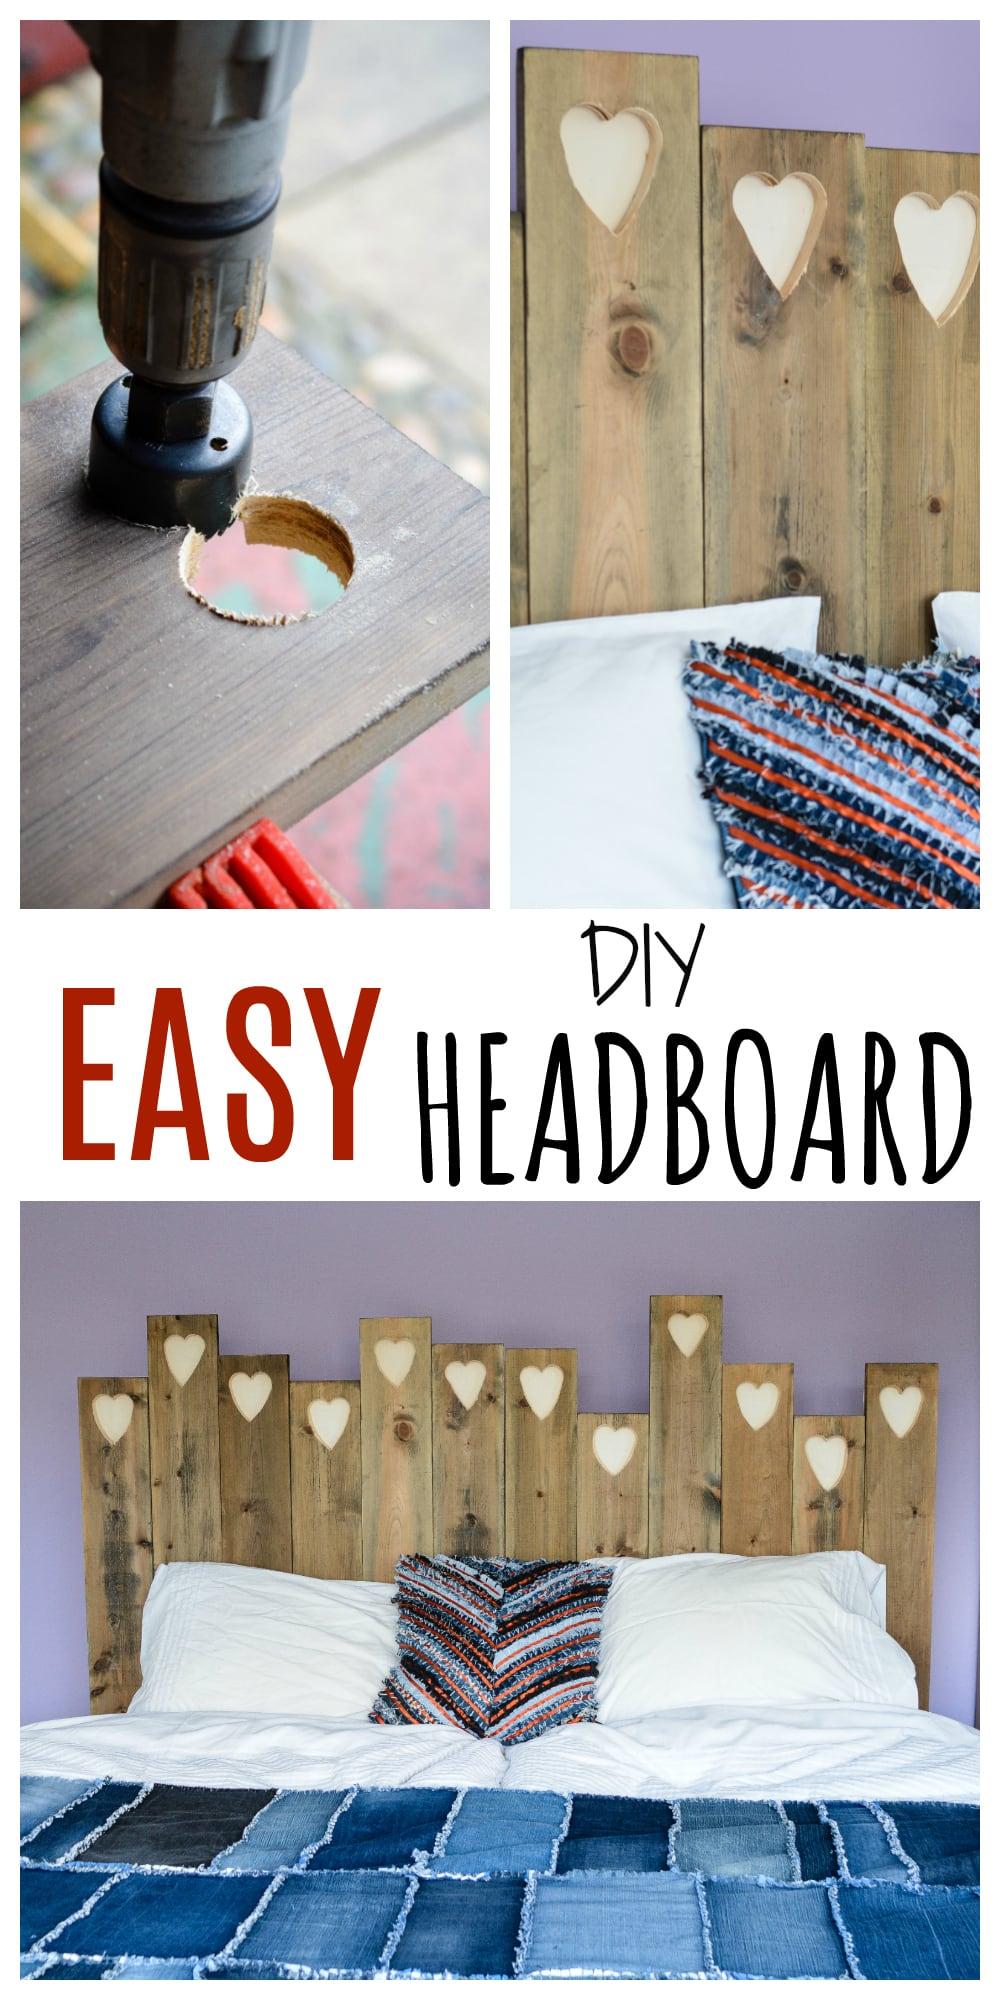 Easy DIY Headboard, transform old planks of wood into stylish headboard, tutorial